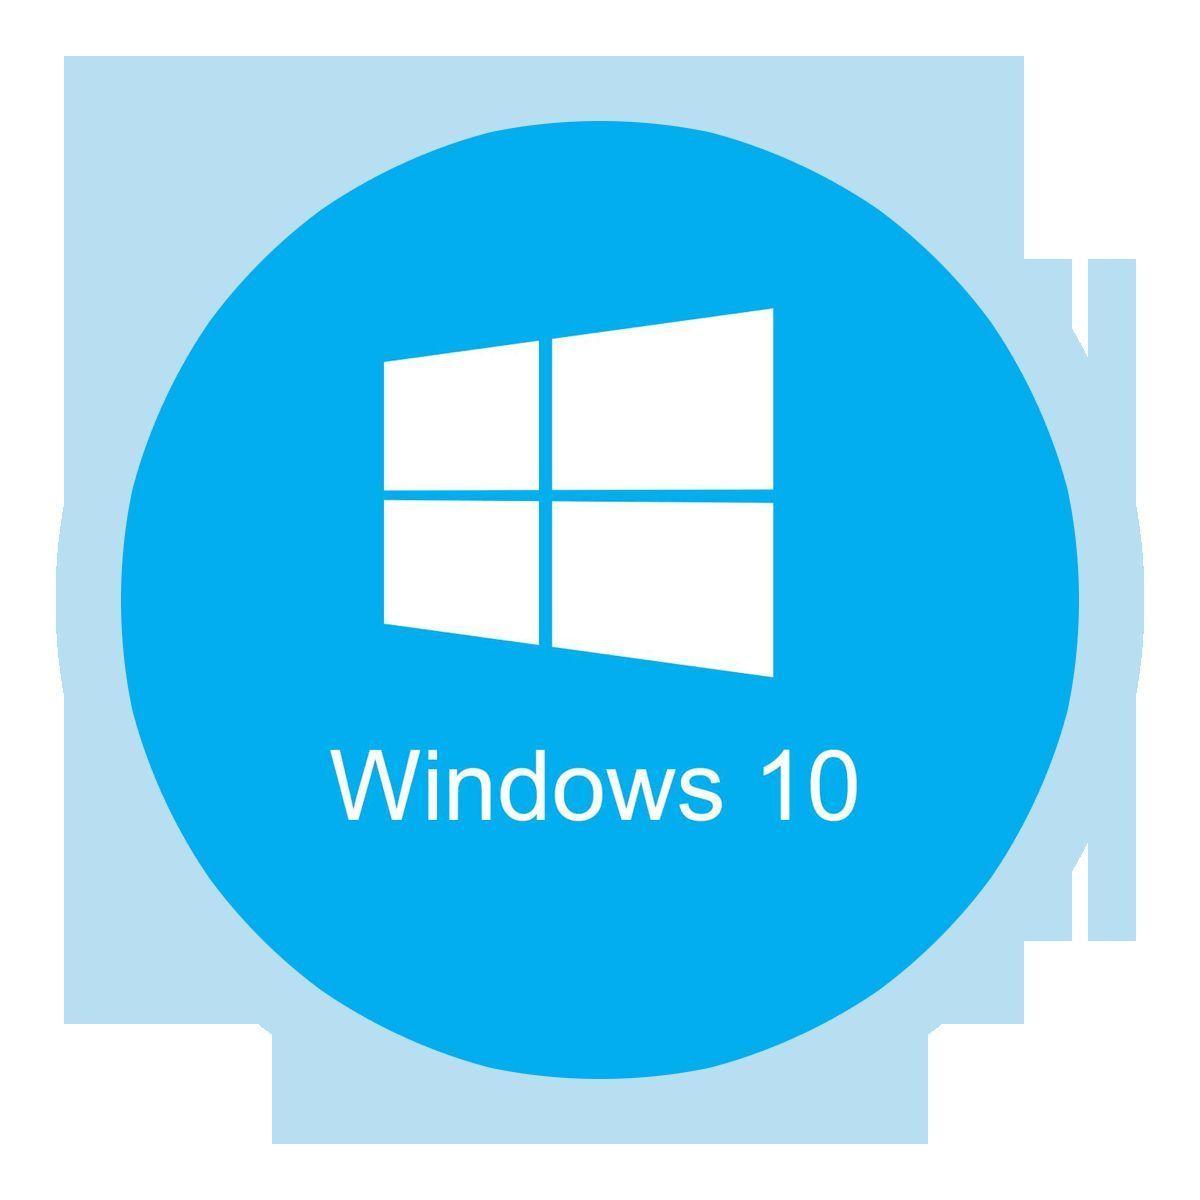 windows 10 home license uk